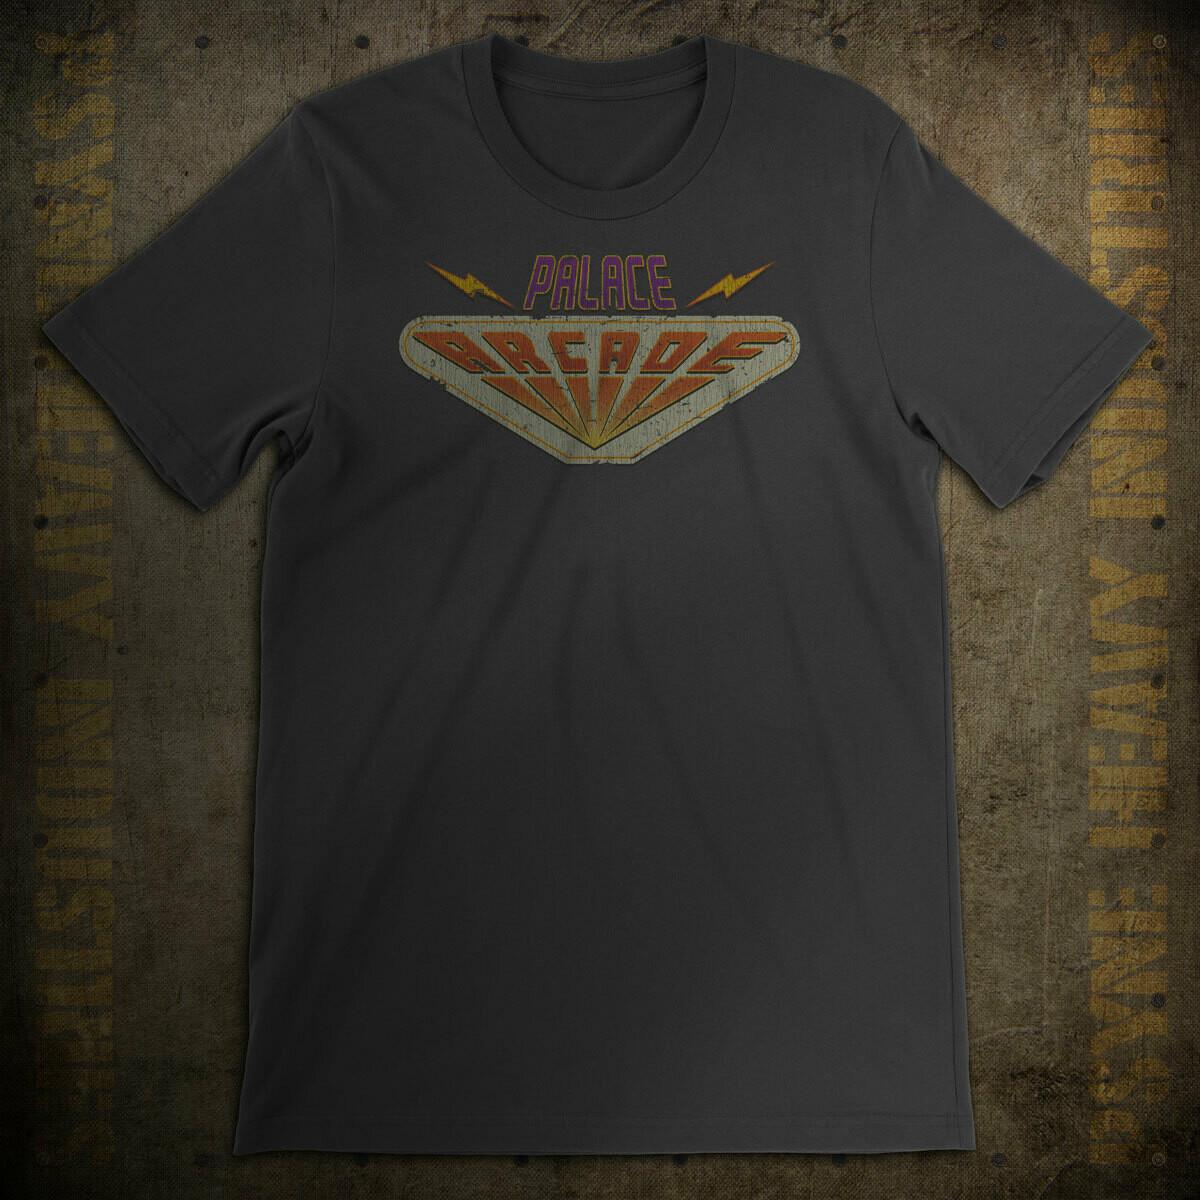 Palace Arcade Stranger Things Vintage T-Shirt